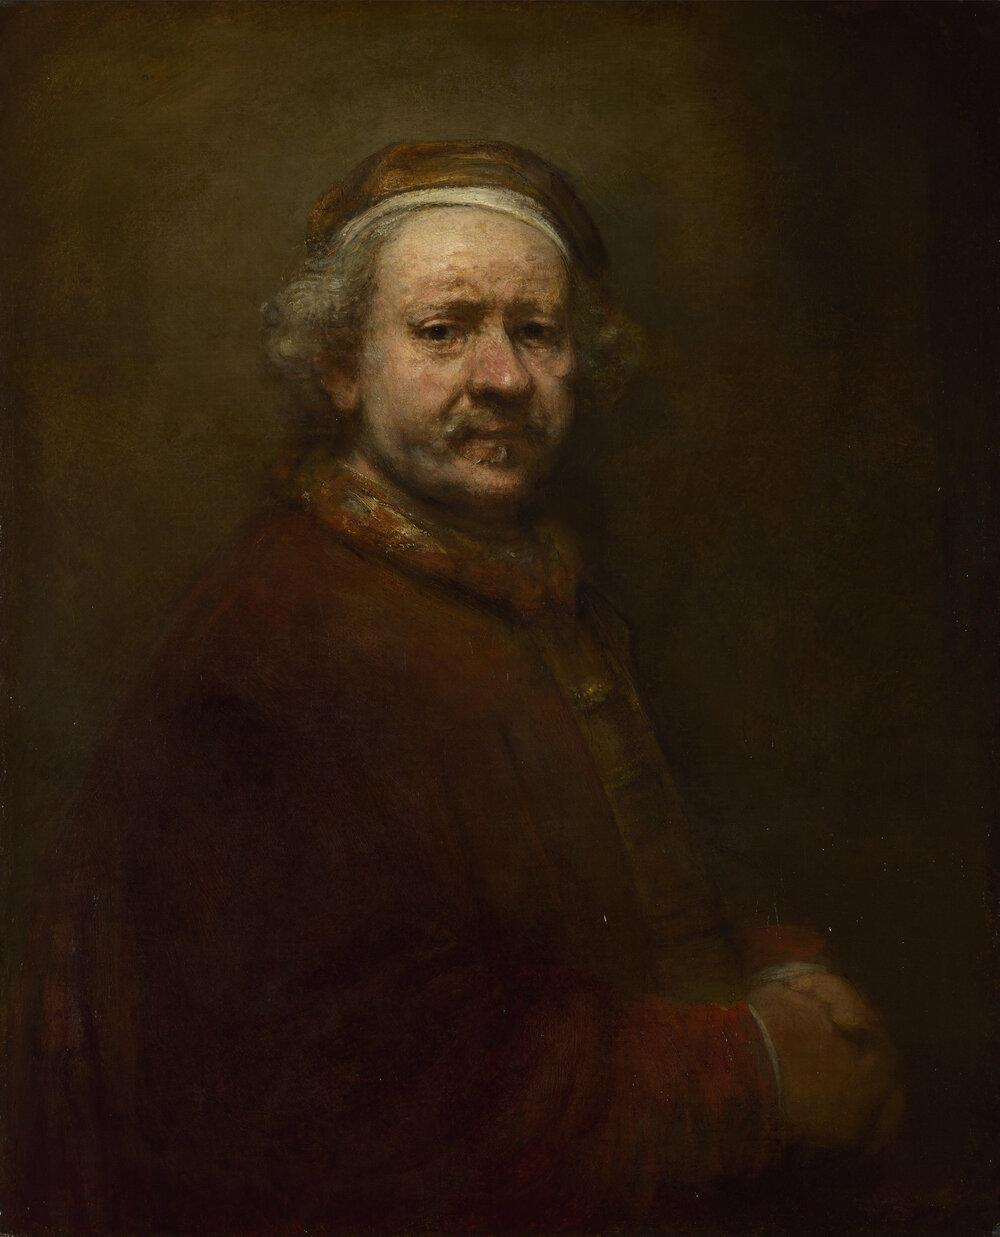 Автопортрет, Рембрандт ван Рей, 1669 ©WIKIMEDIA COMMONS